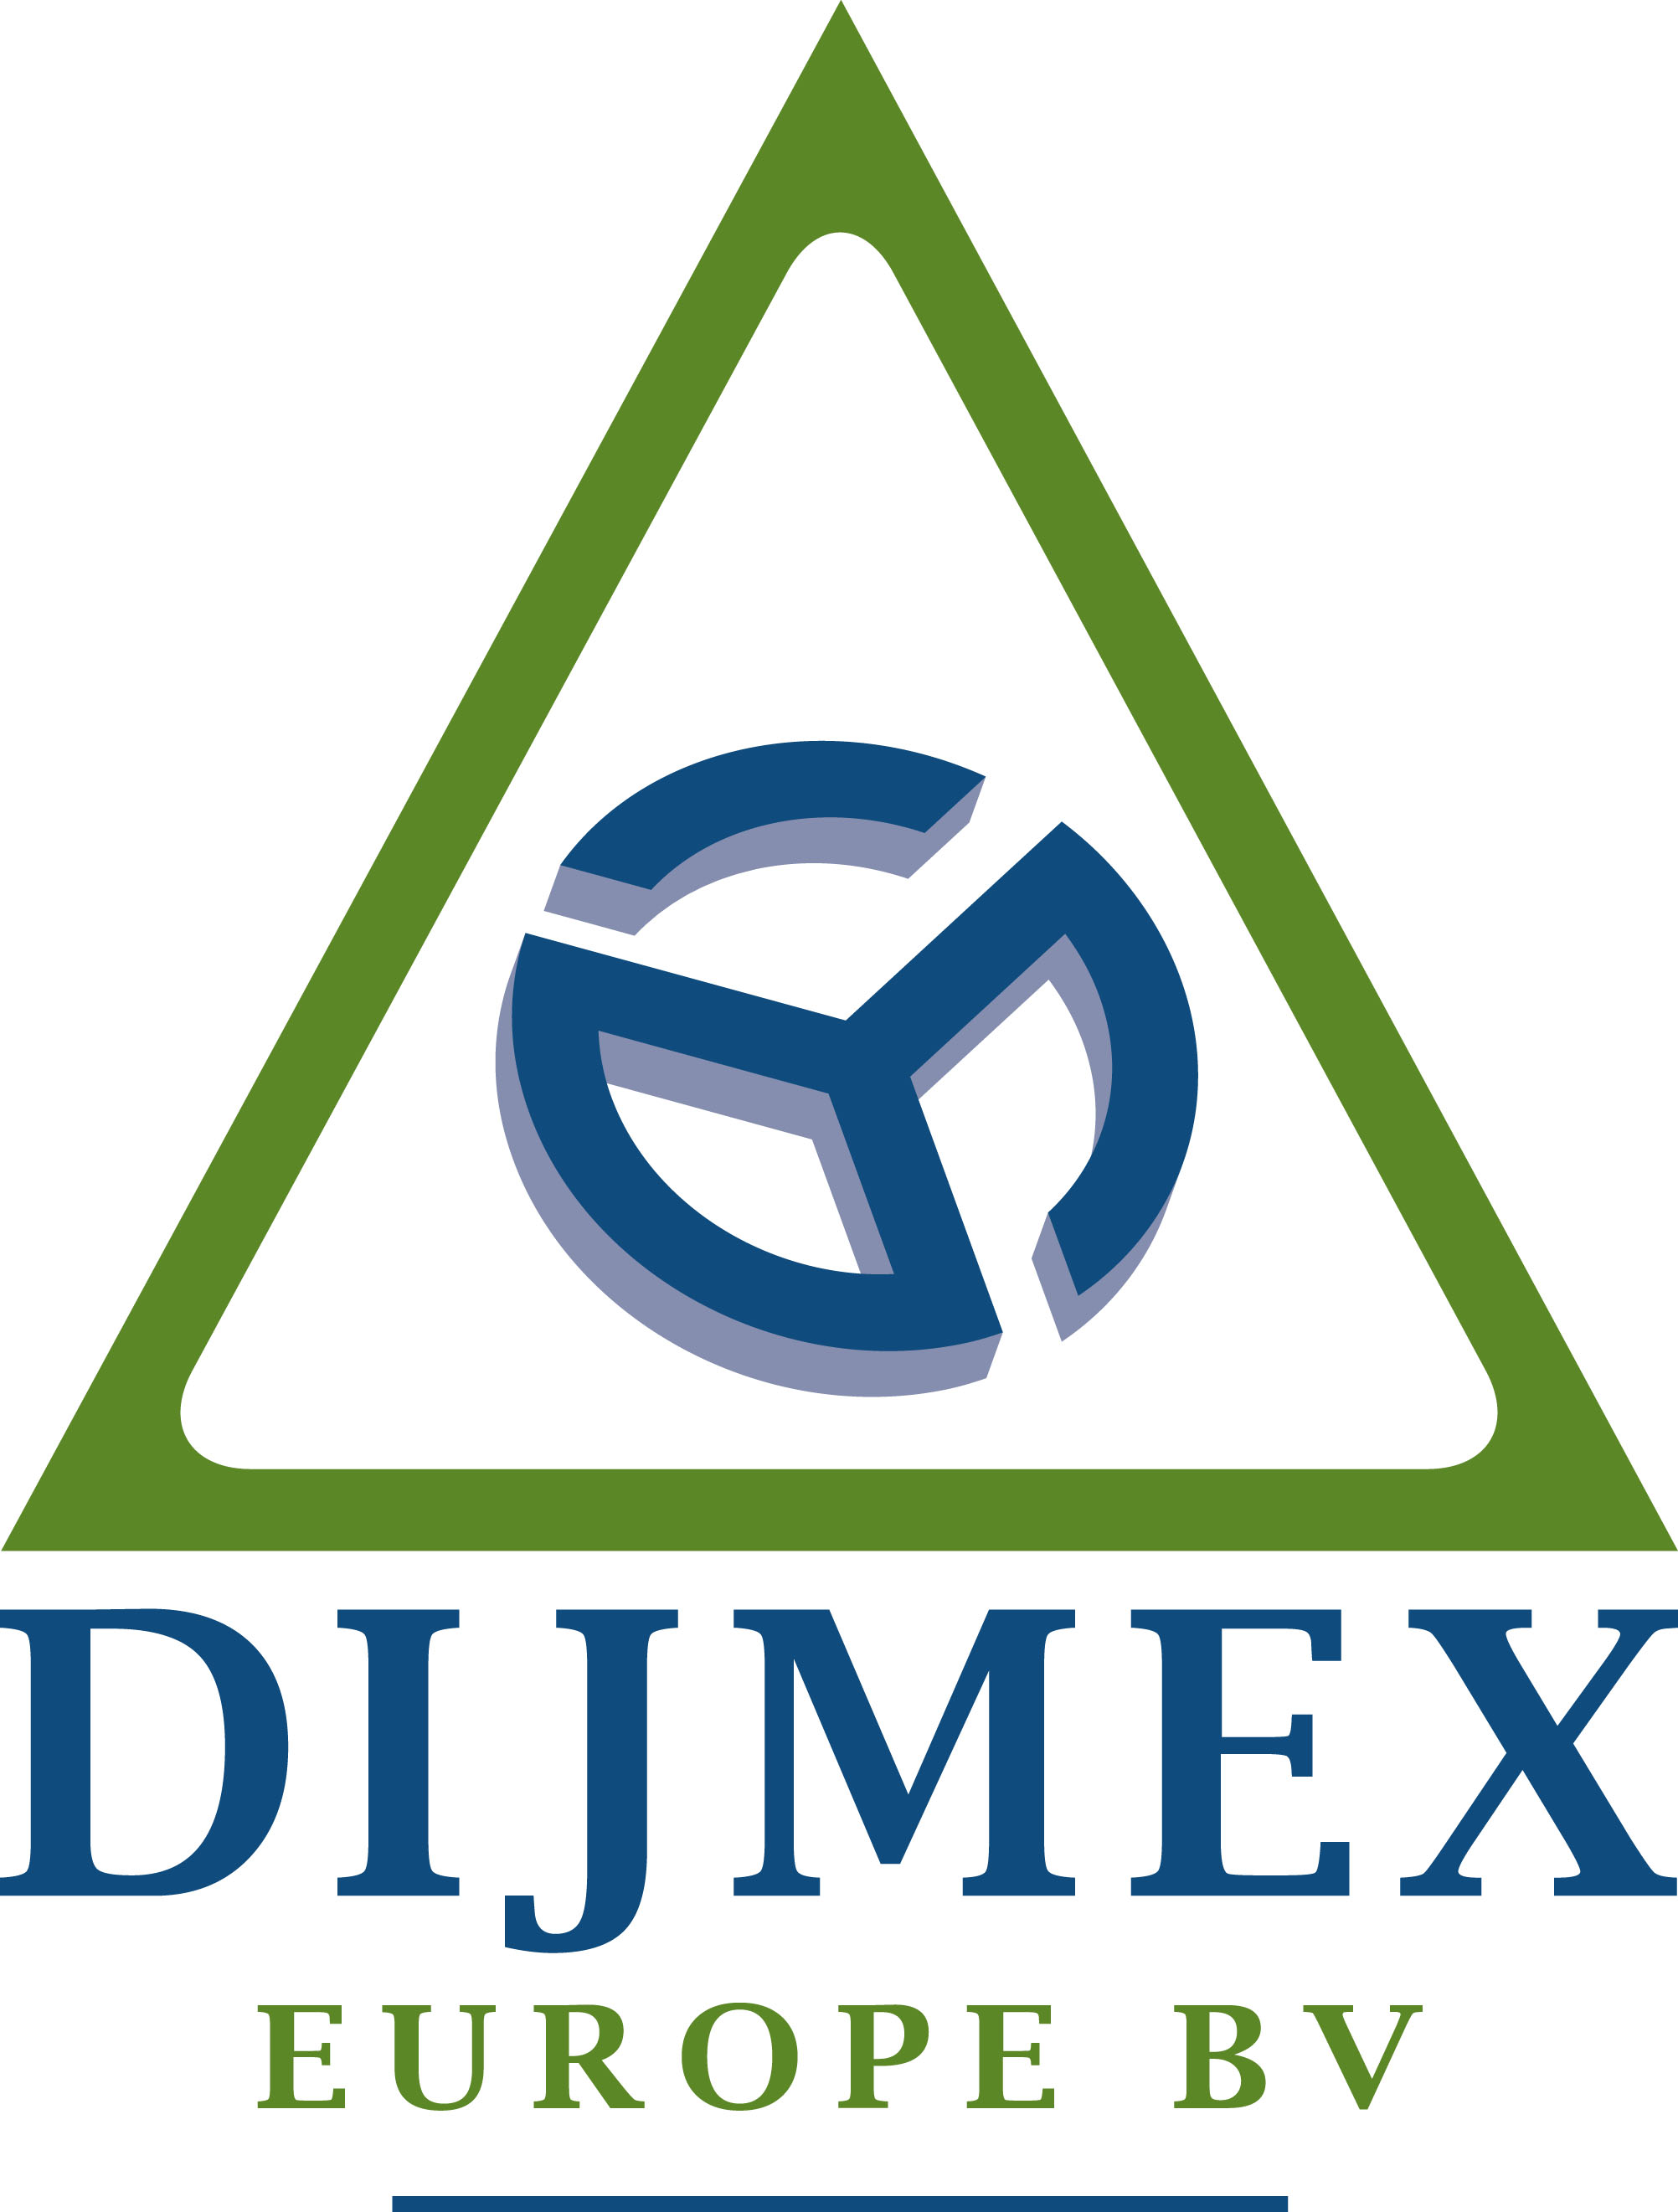 Dijmex Europe B.V